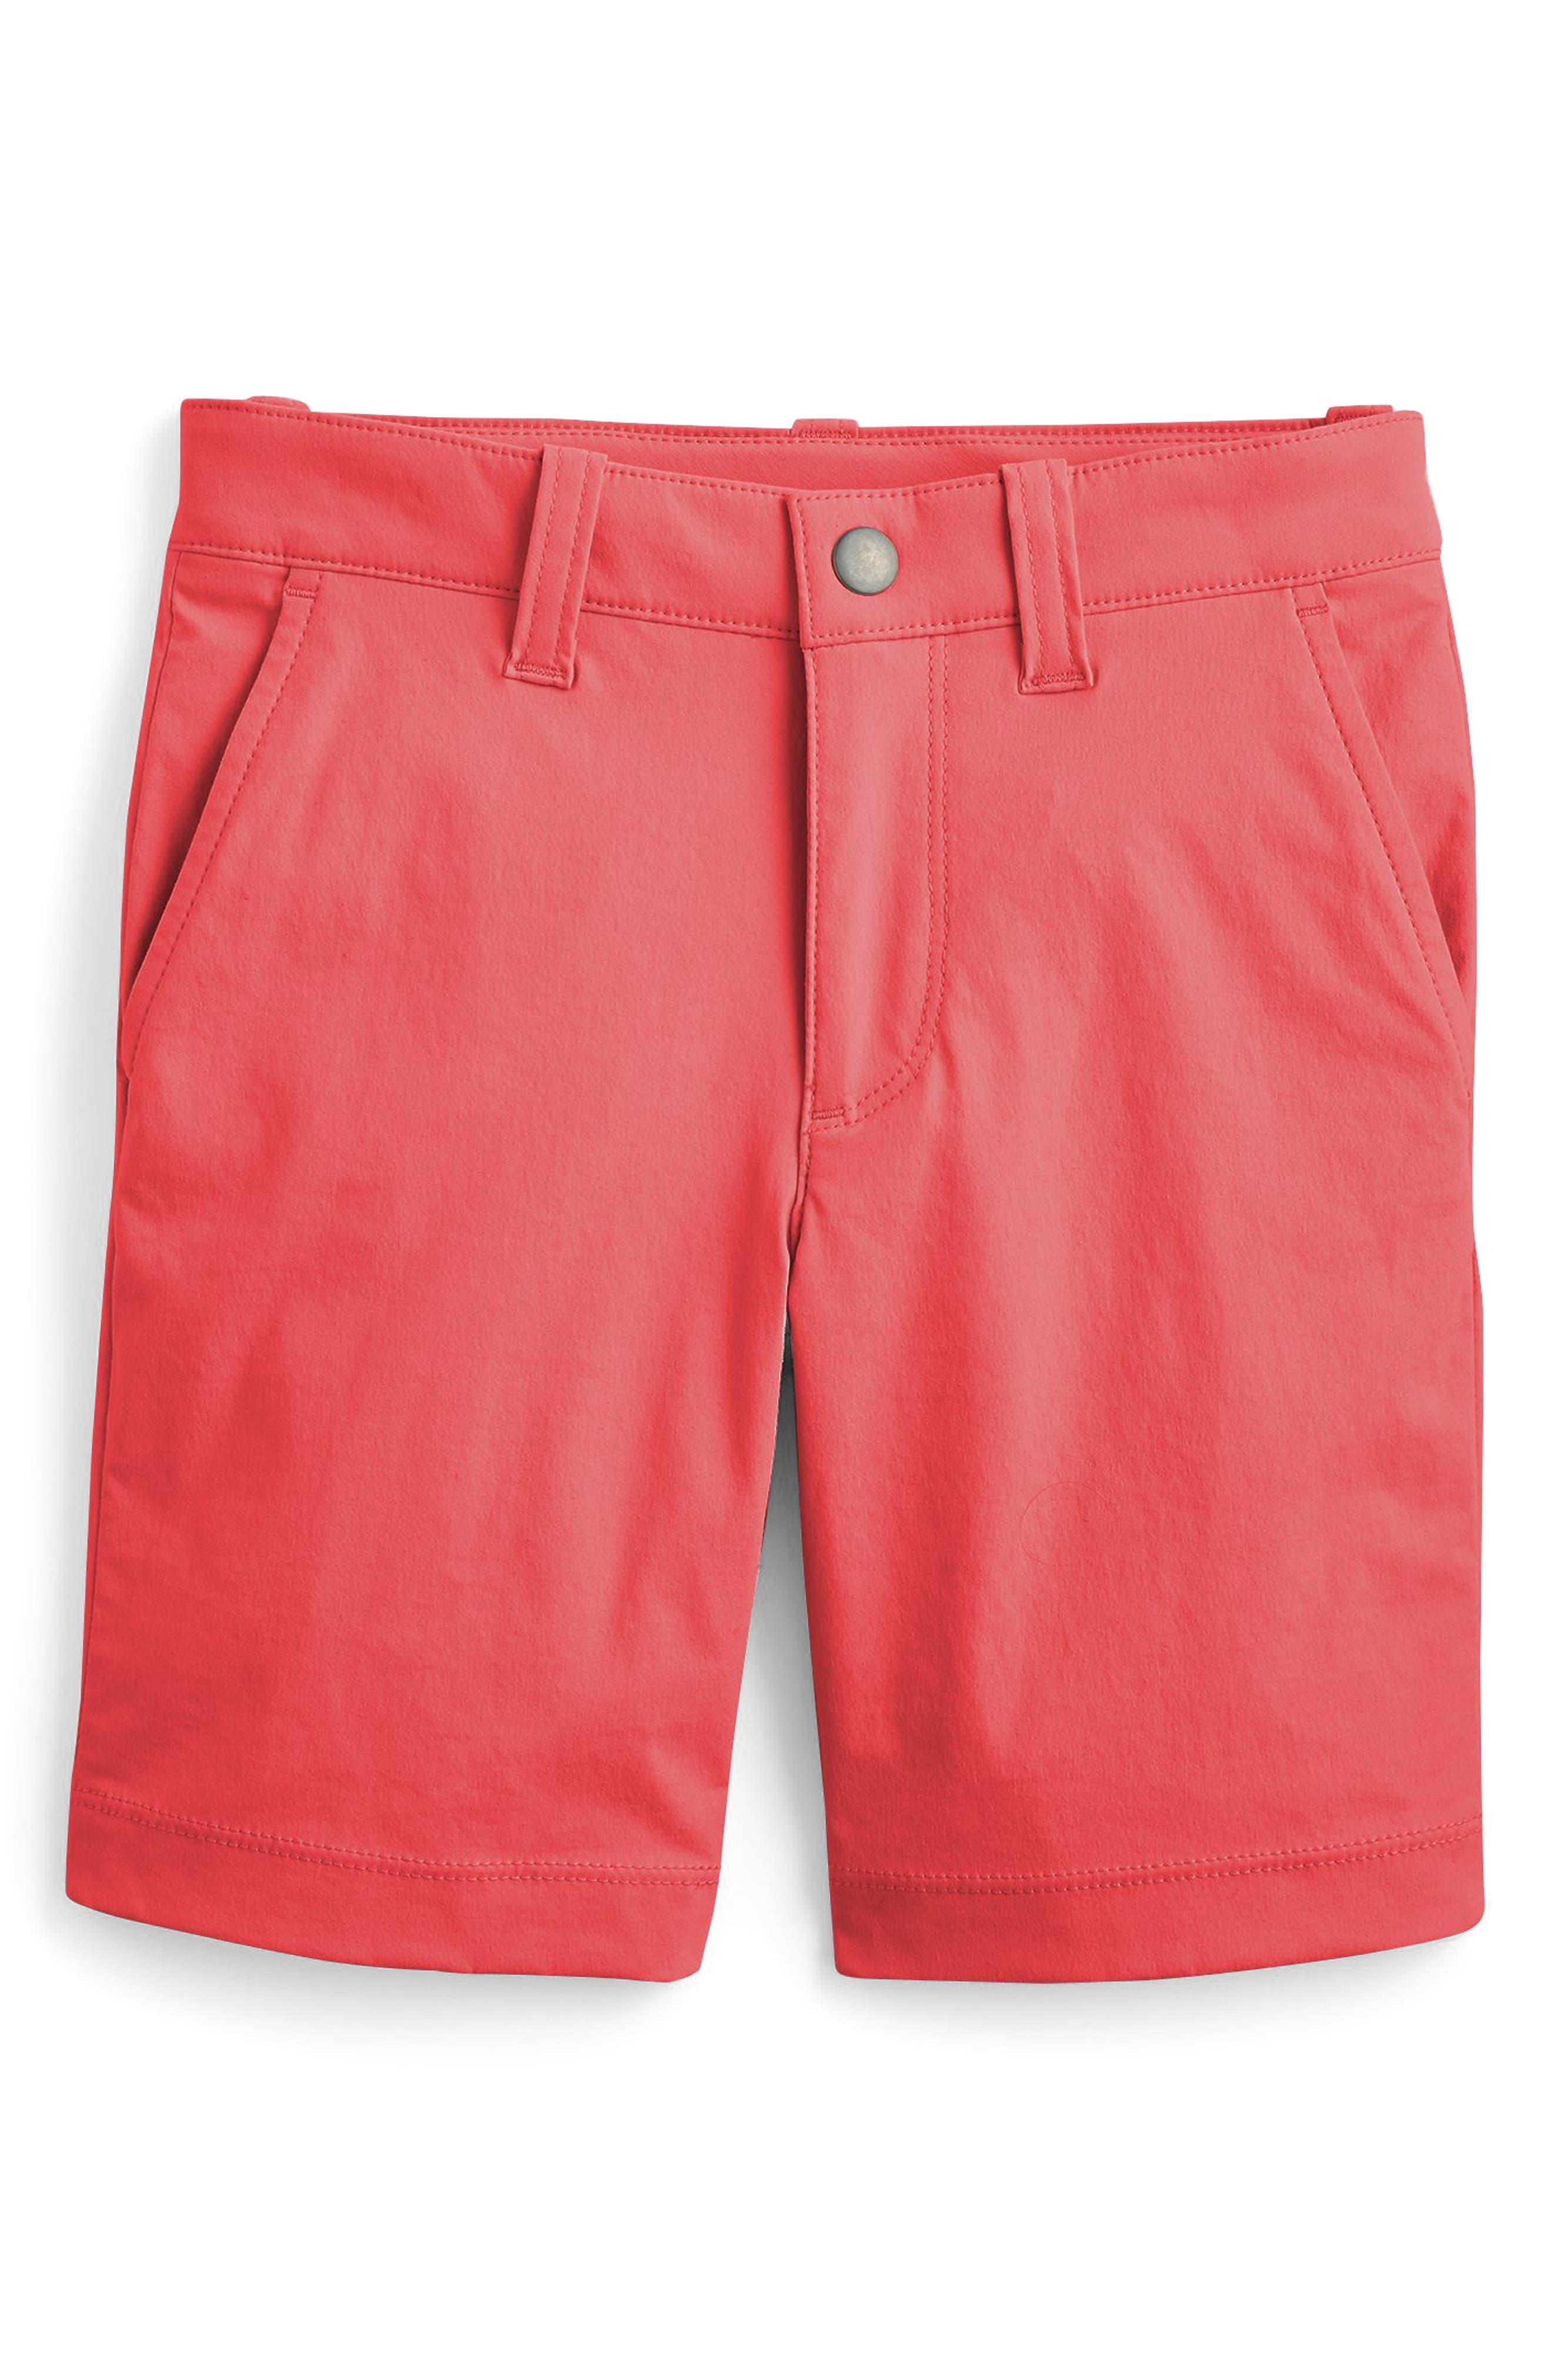 Tech Shorts,                             Main thumbnail 1, color,                             Fiery Red